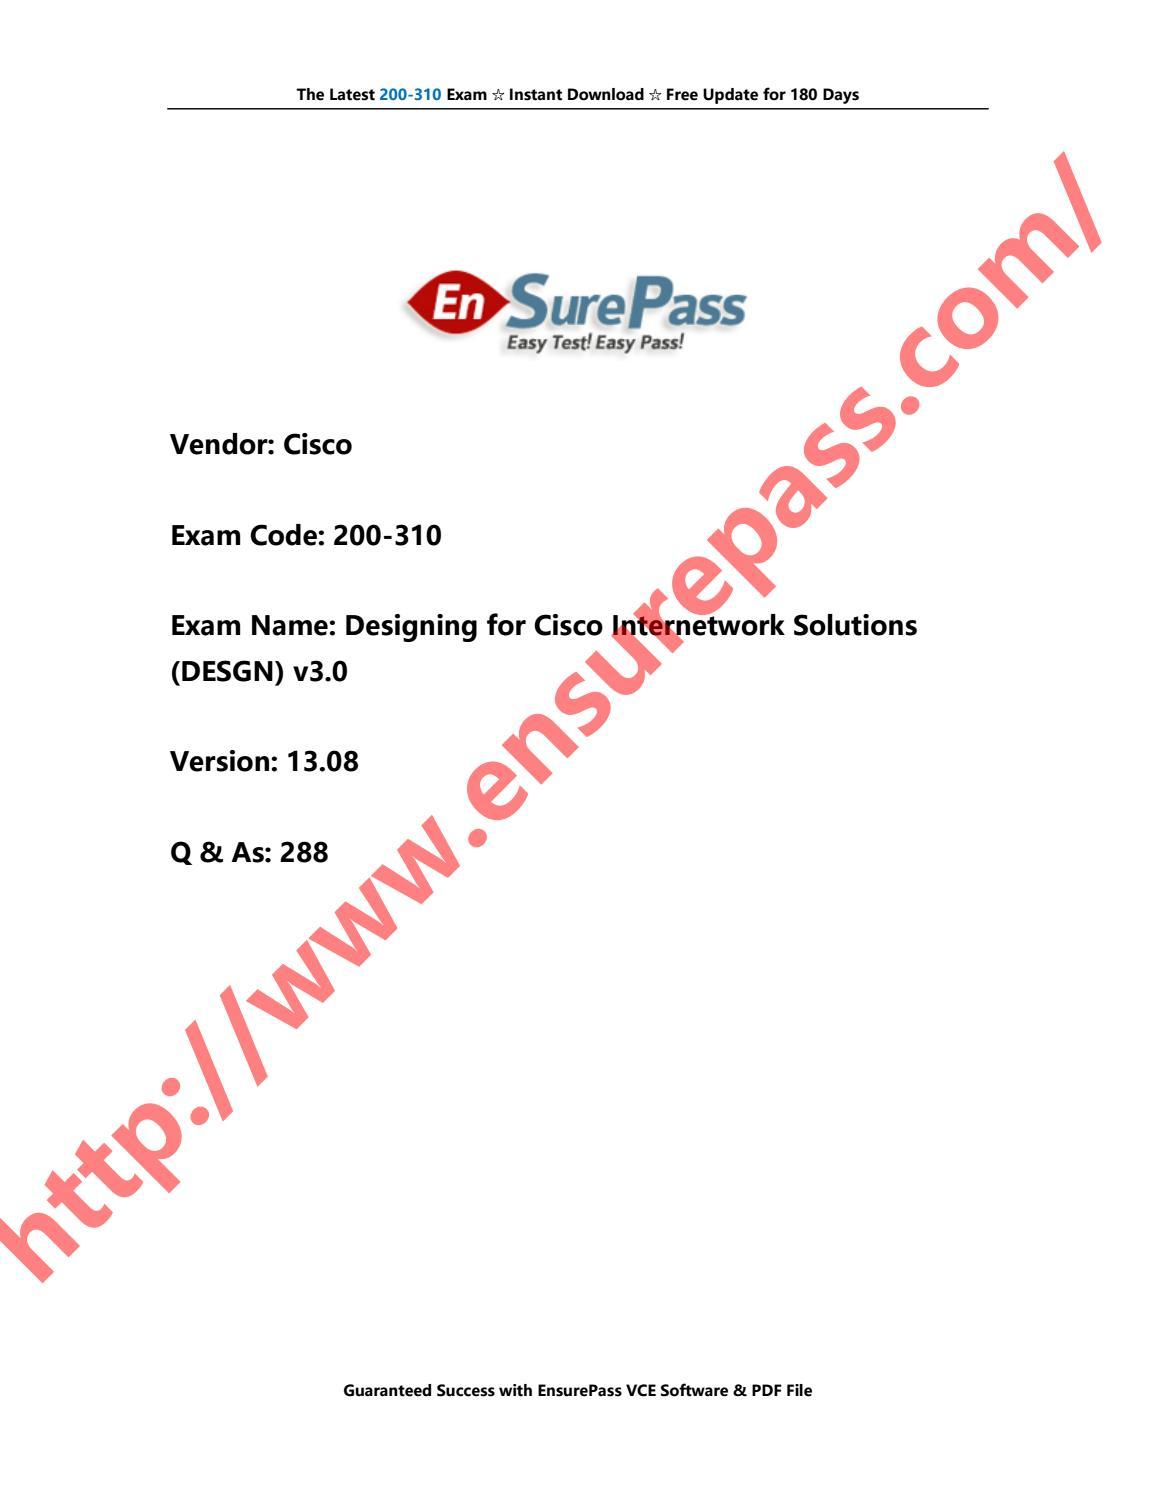 Ensurepass Cisco 200-310 Exam Dumps and PDF by